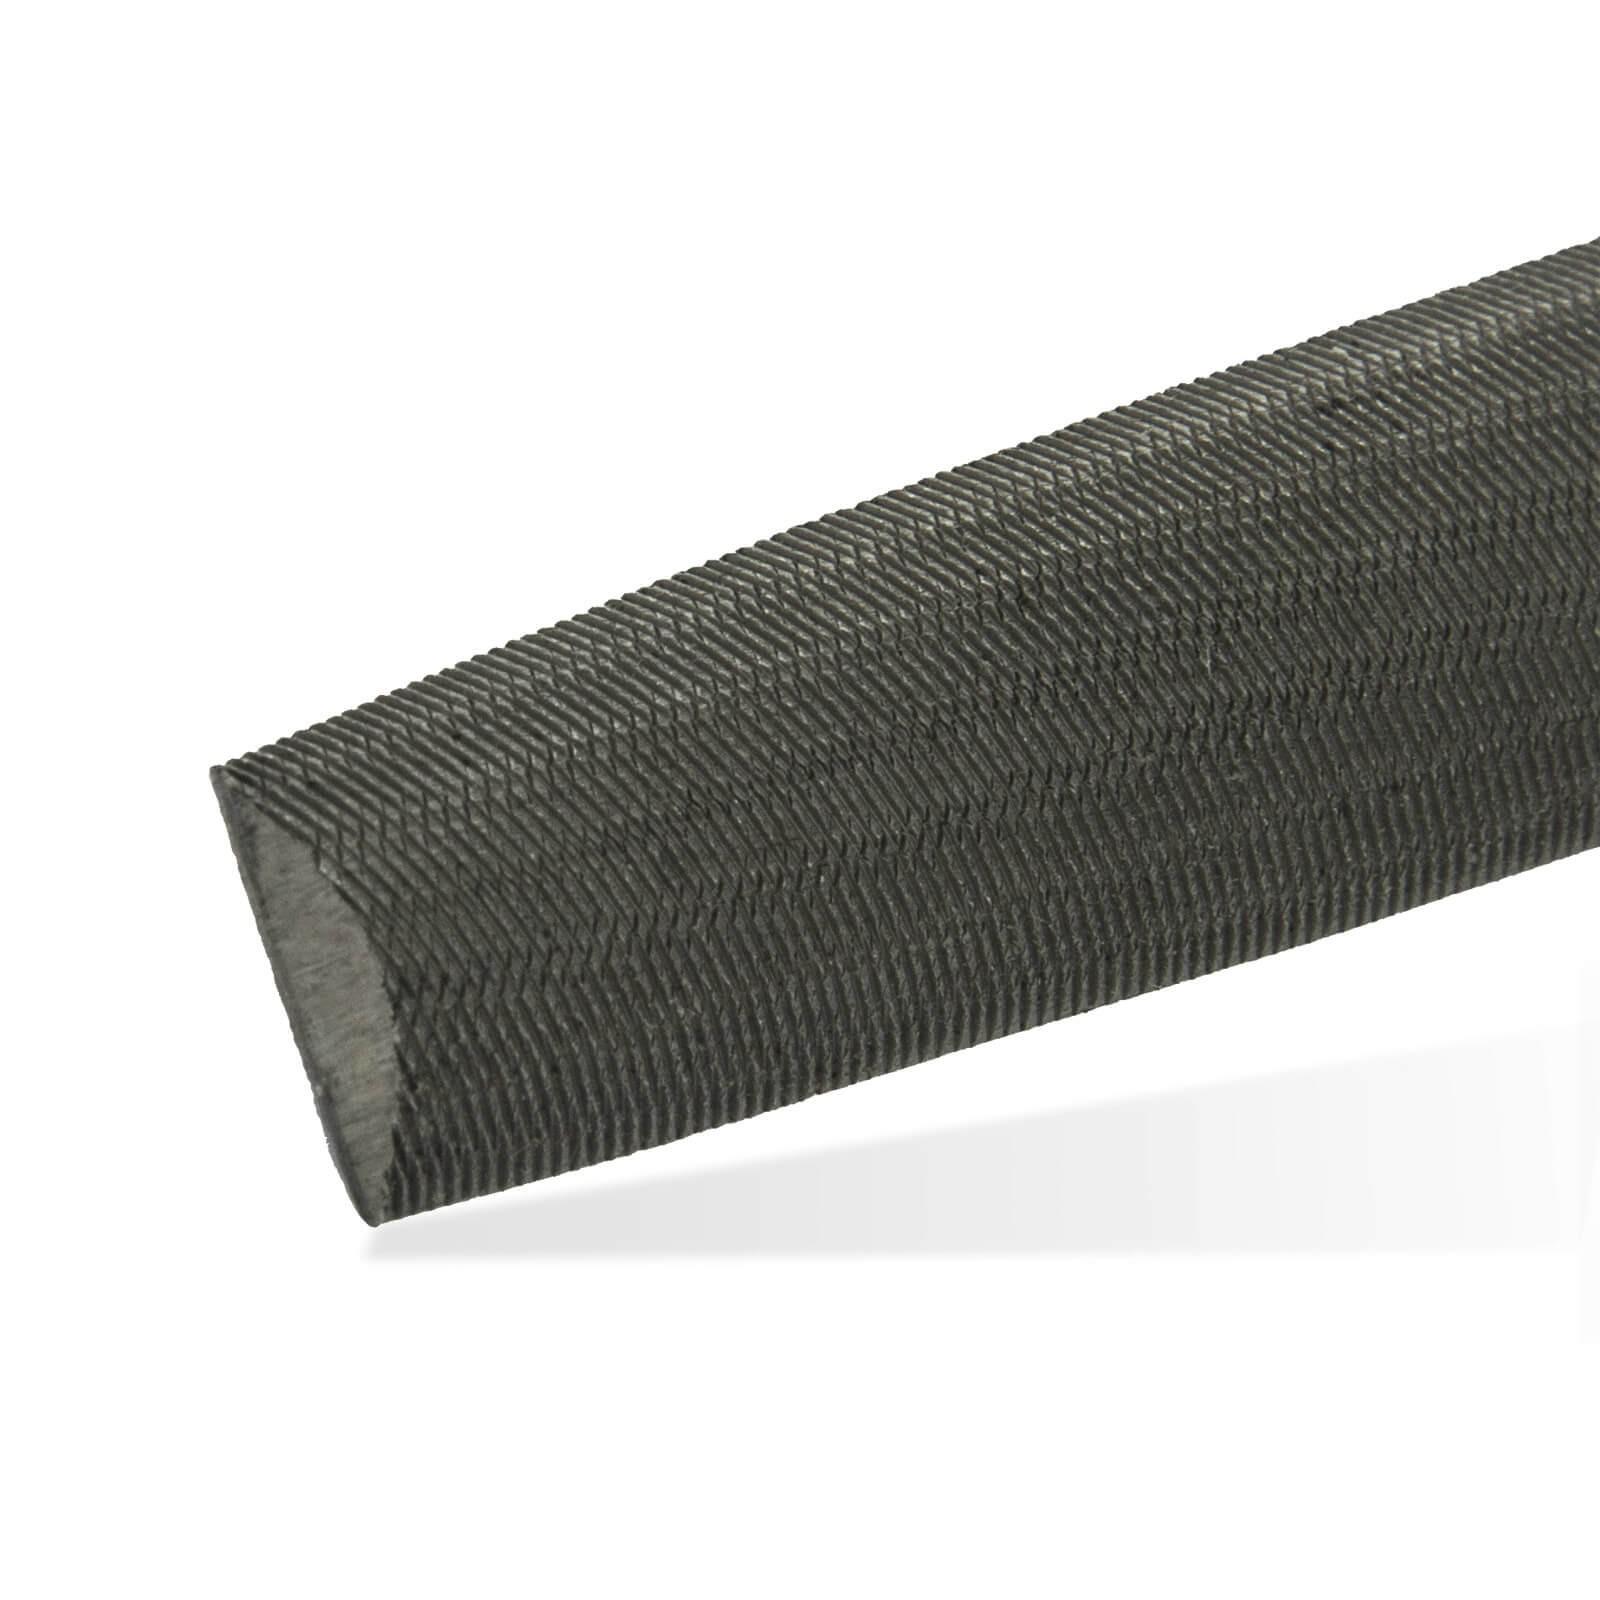 halbrundfeile hieb 2 hf250 mit kreuzhieb. Black Bedroom Furniture Sets. Home Design Ideas